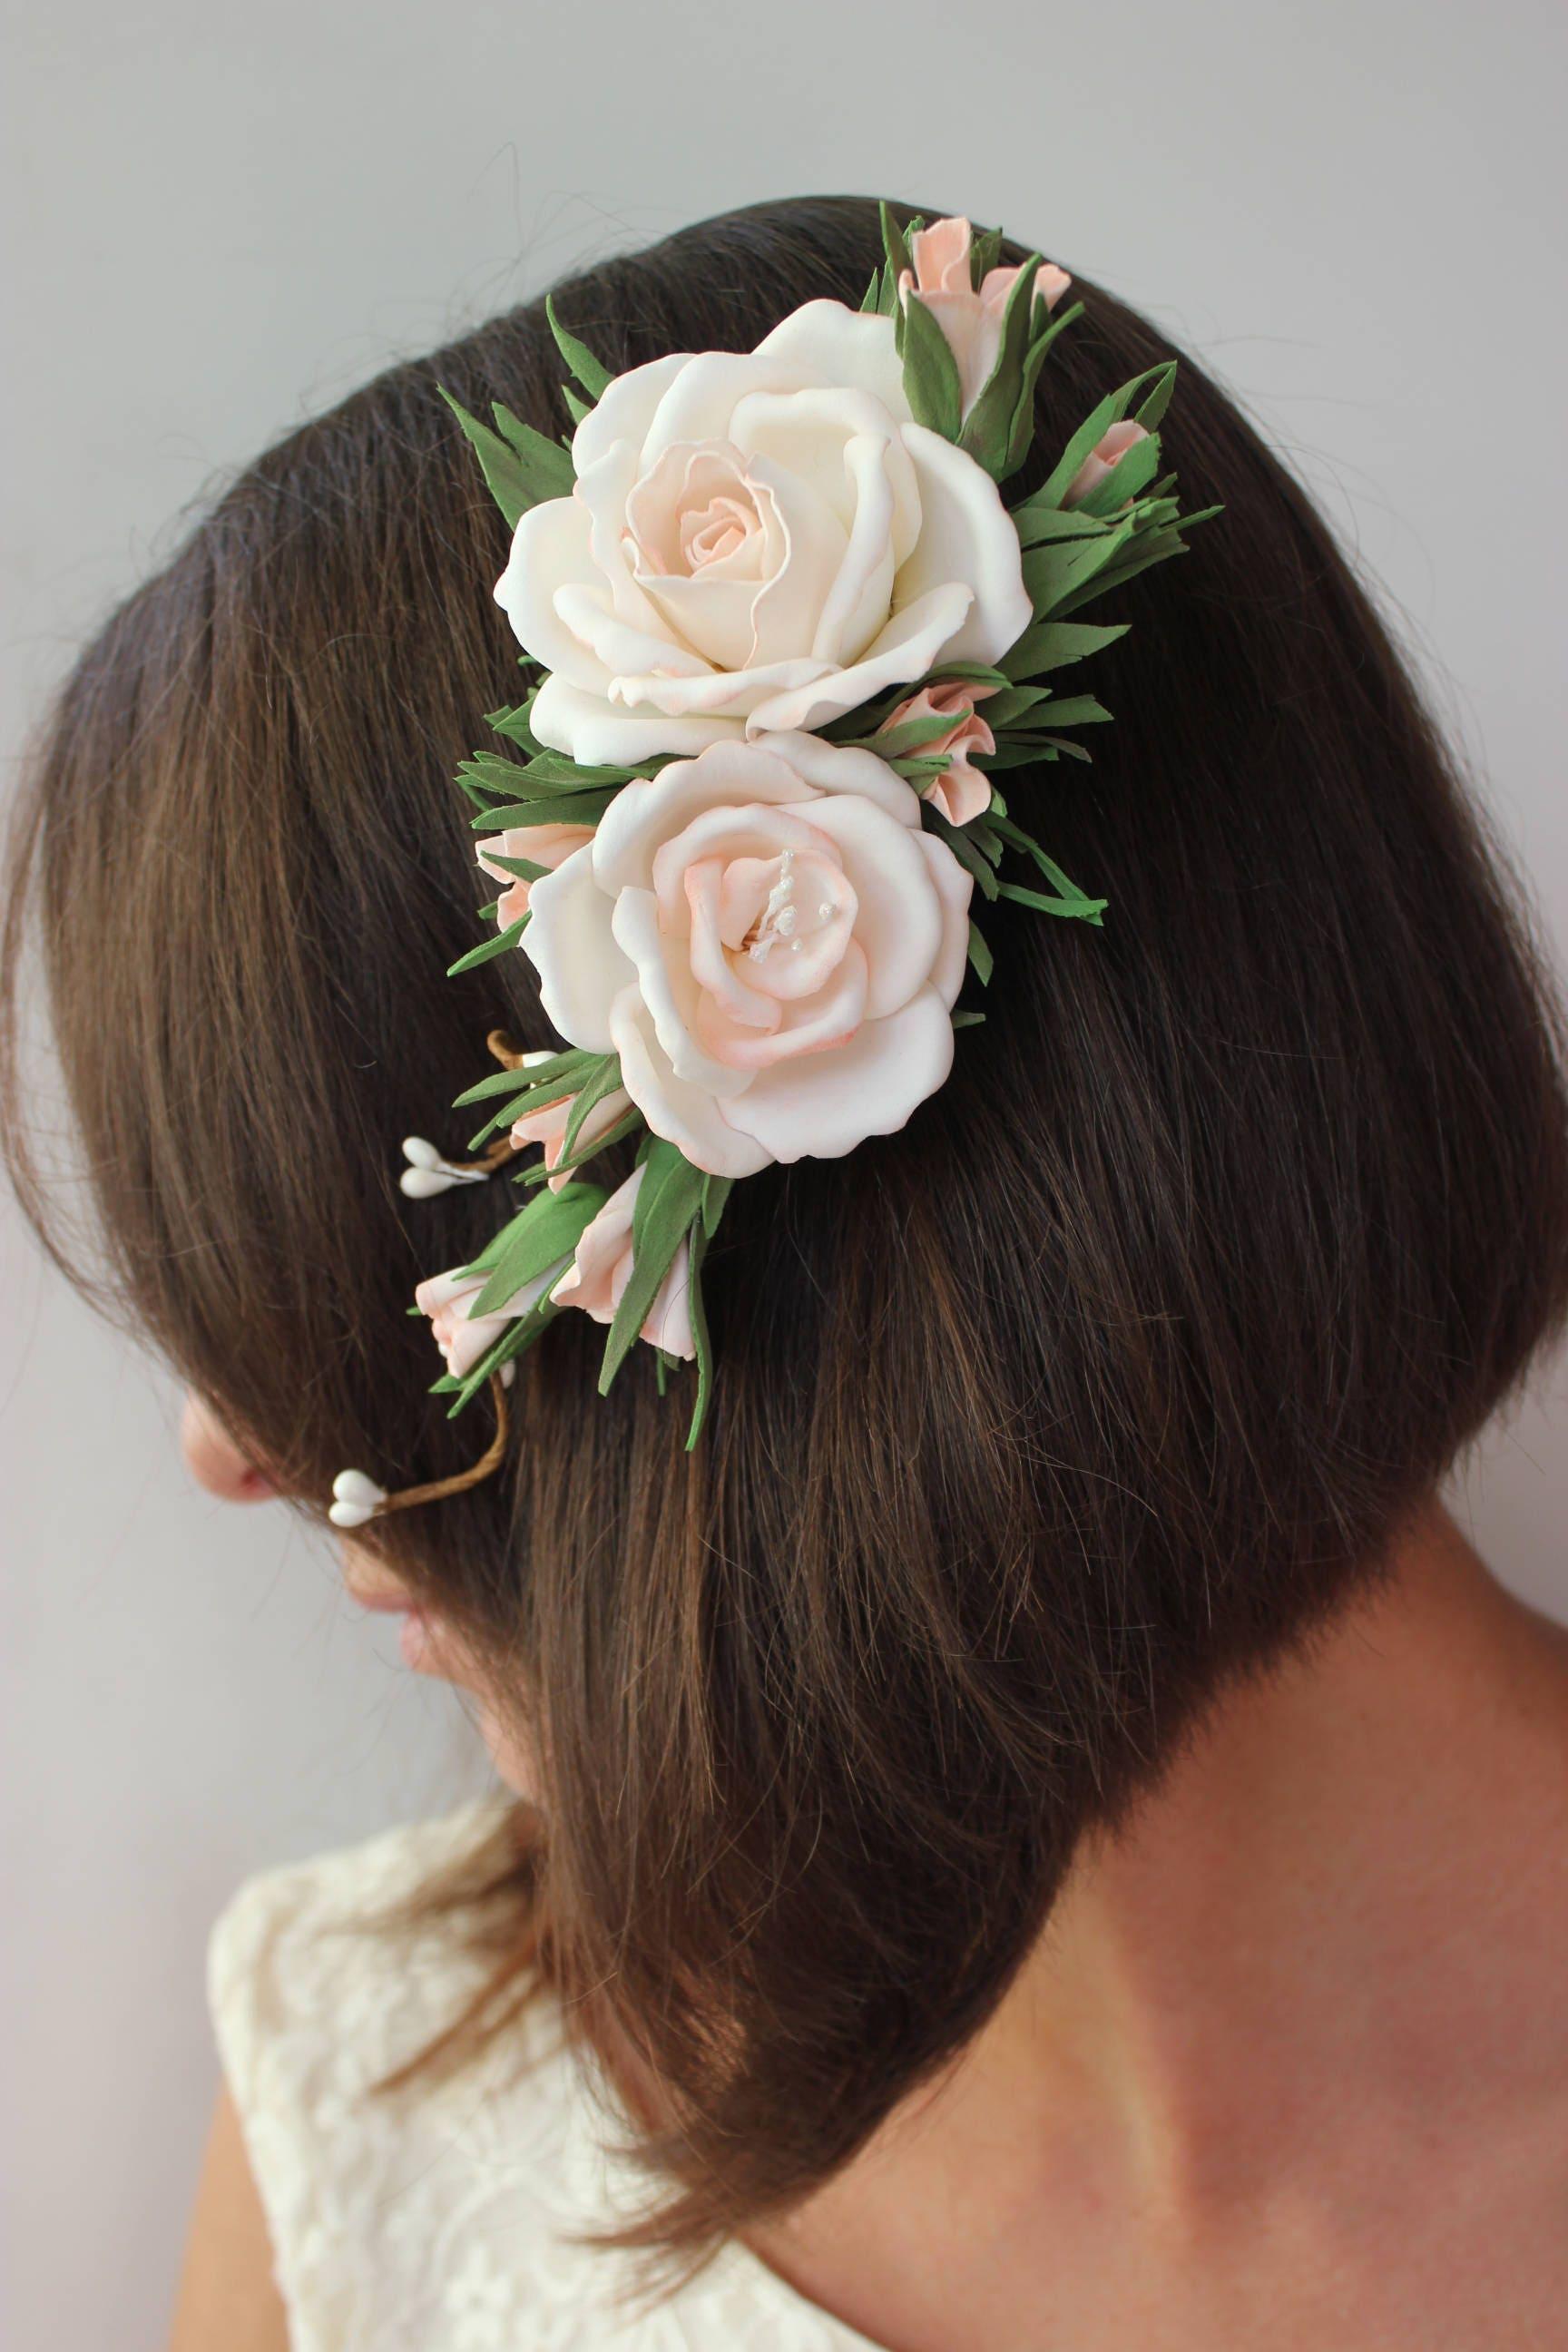 Wedding Accessories Flowers For Hair Bride Women Hair Gift Headpiece